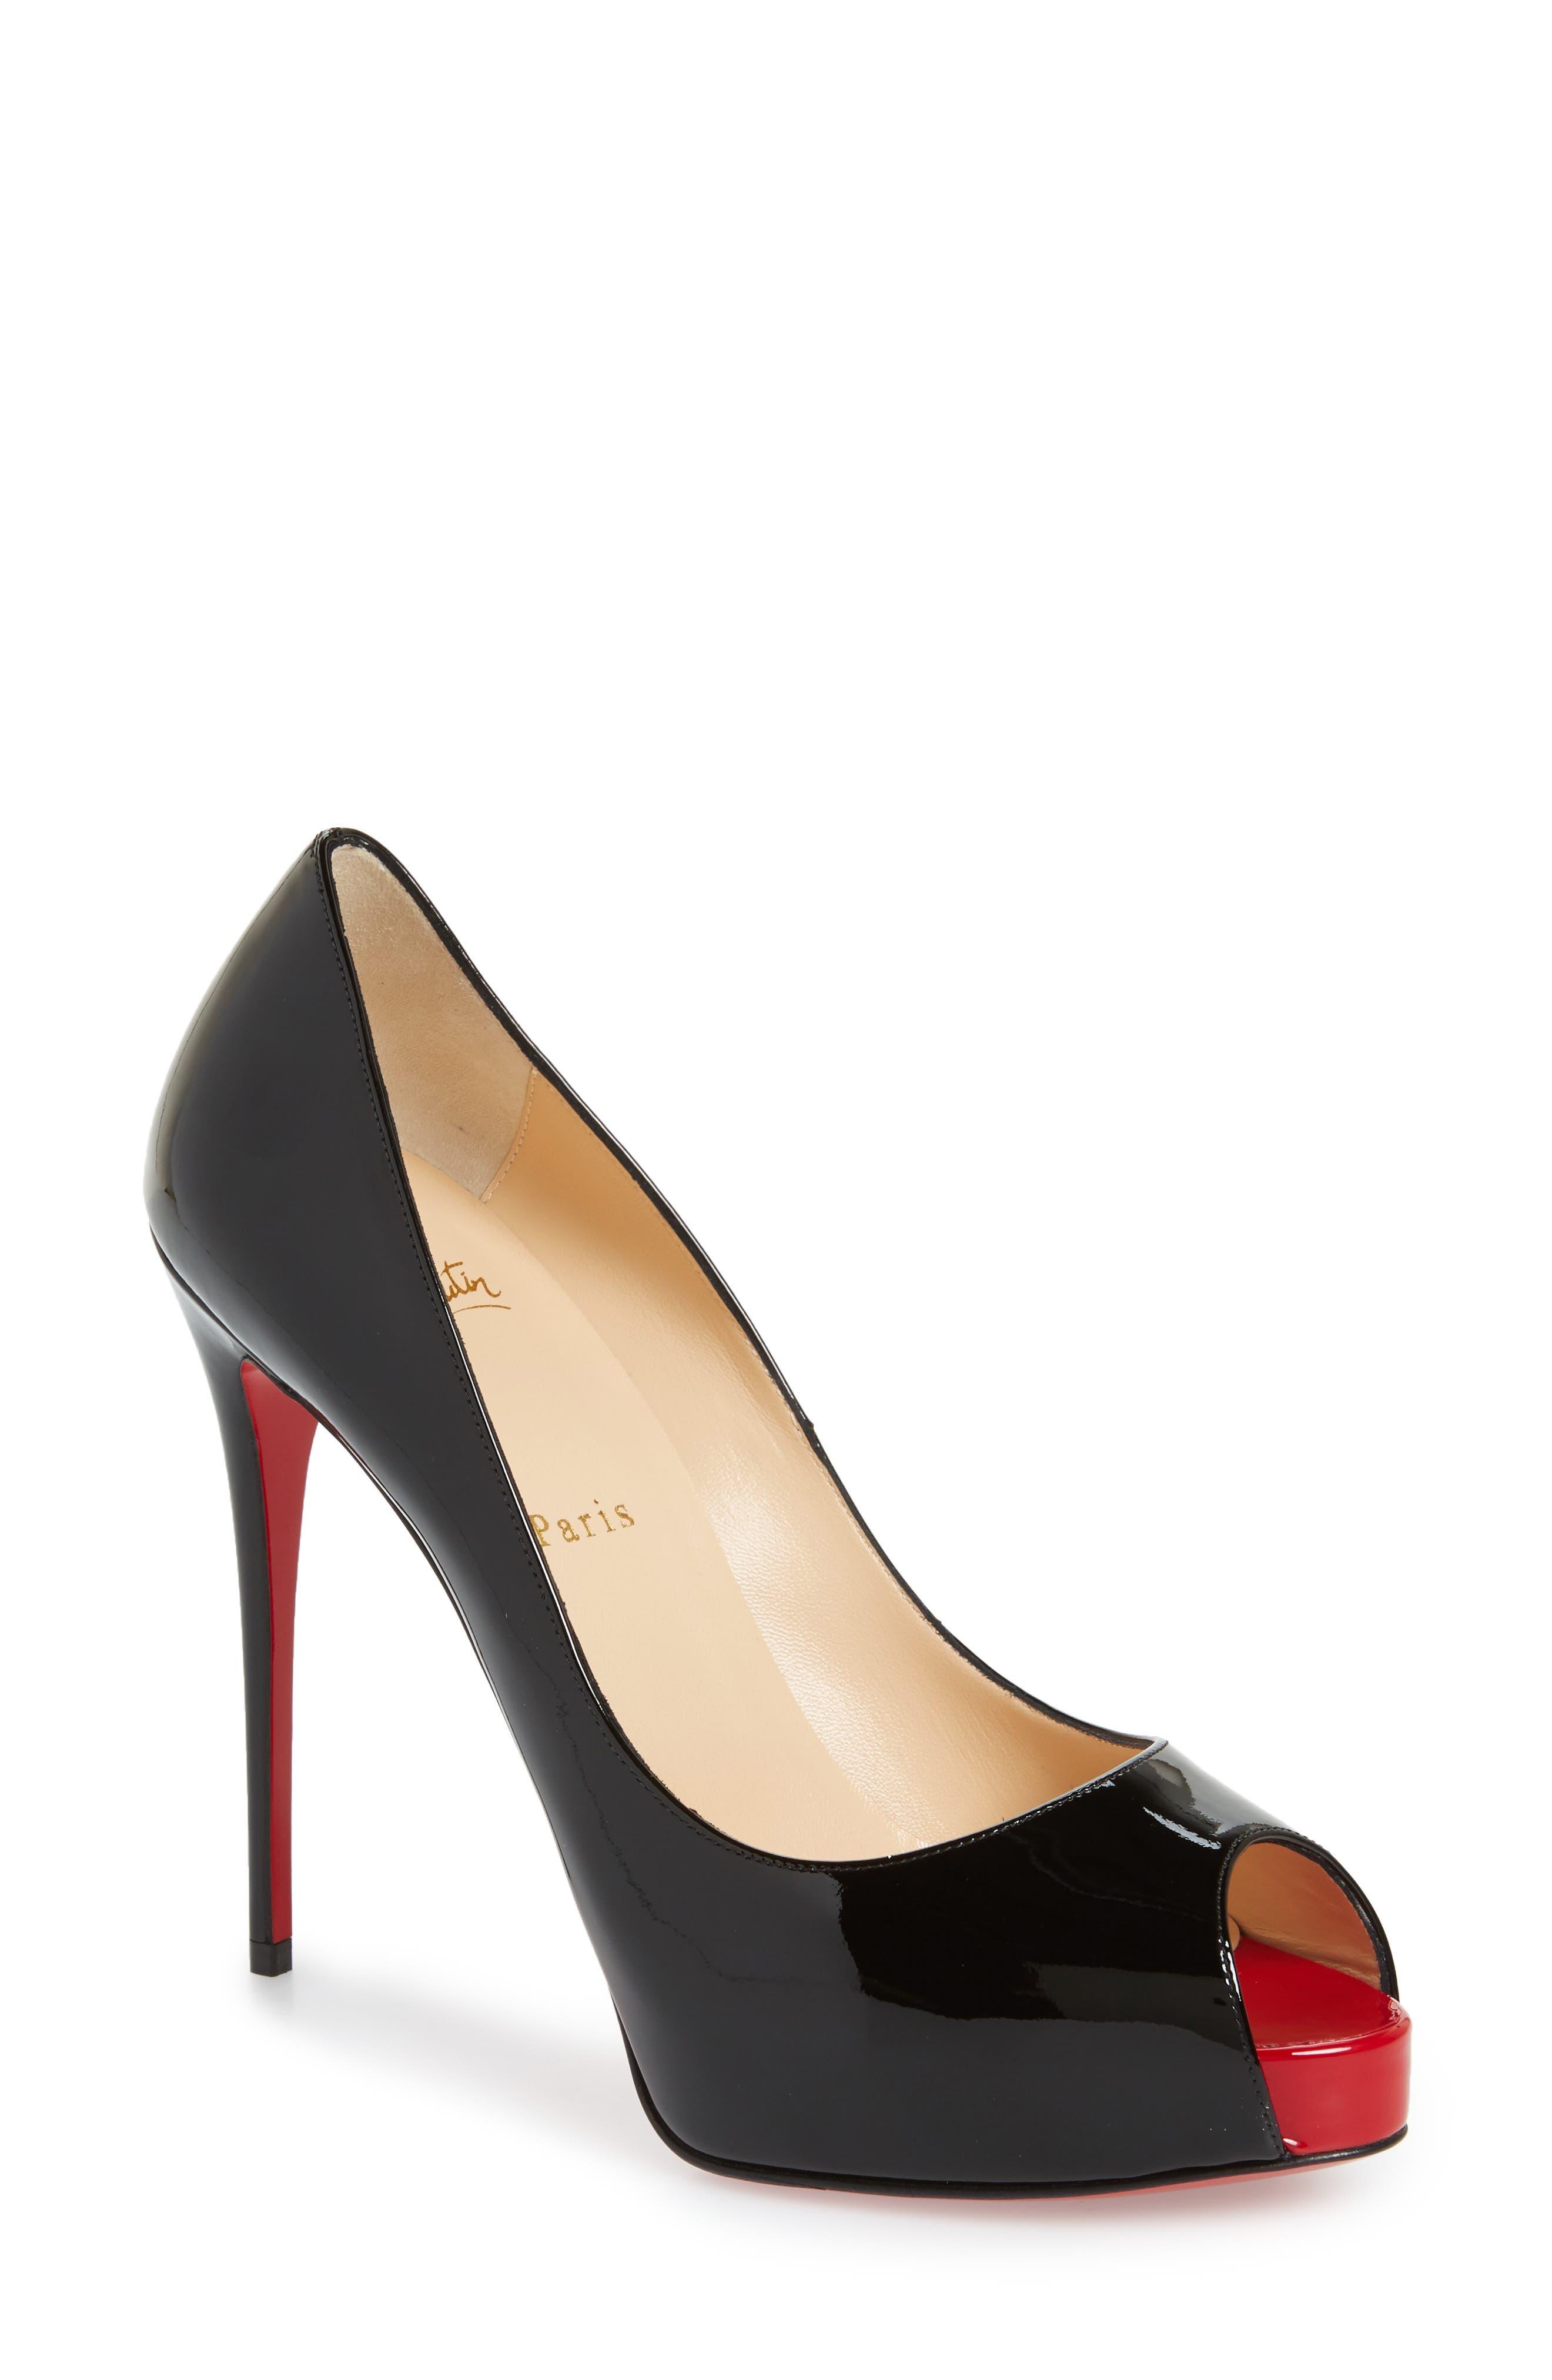 christian louboutin women 39 s shoes. Black Bedroom Furniture Sets. Home Design Ideas